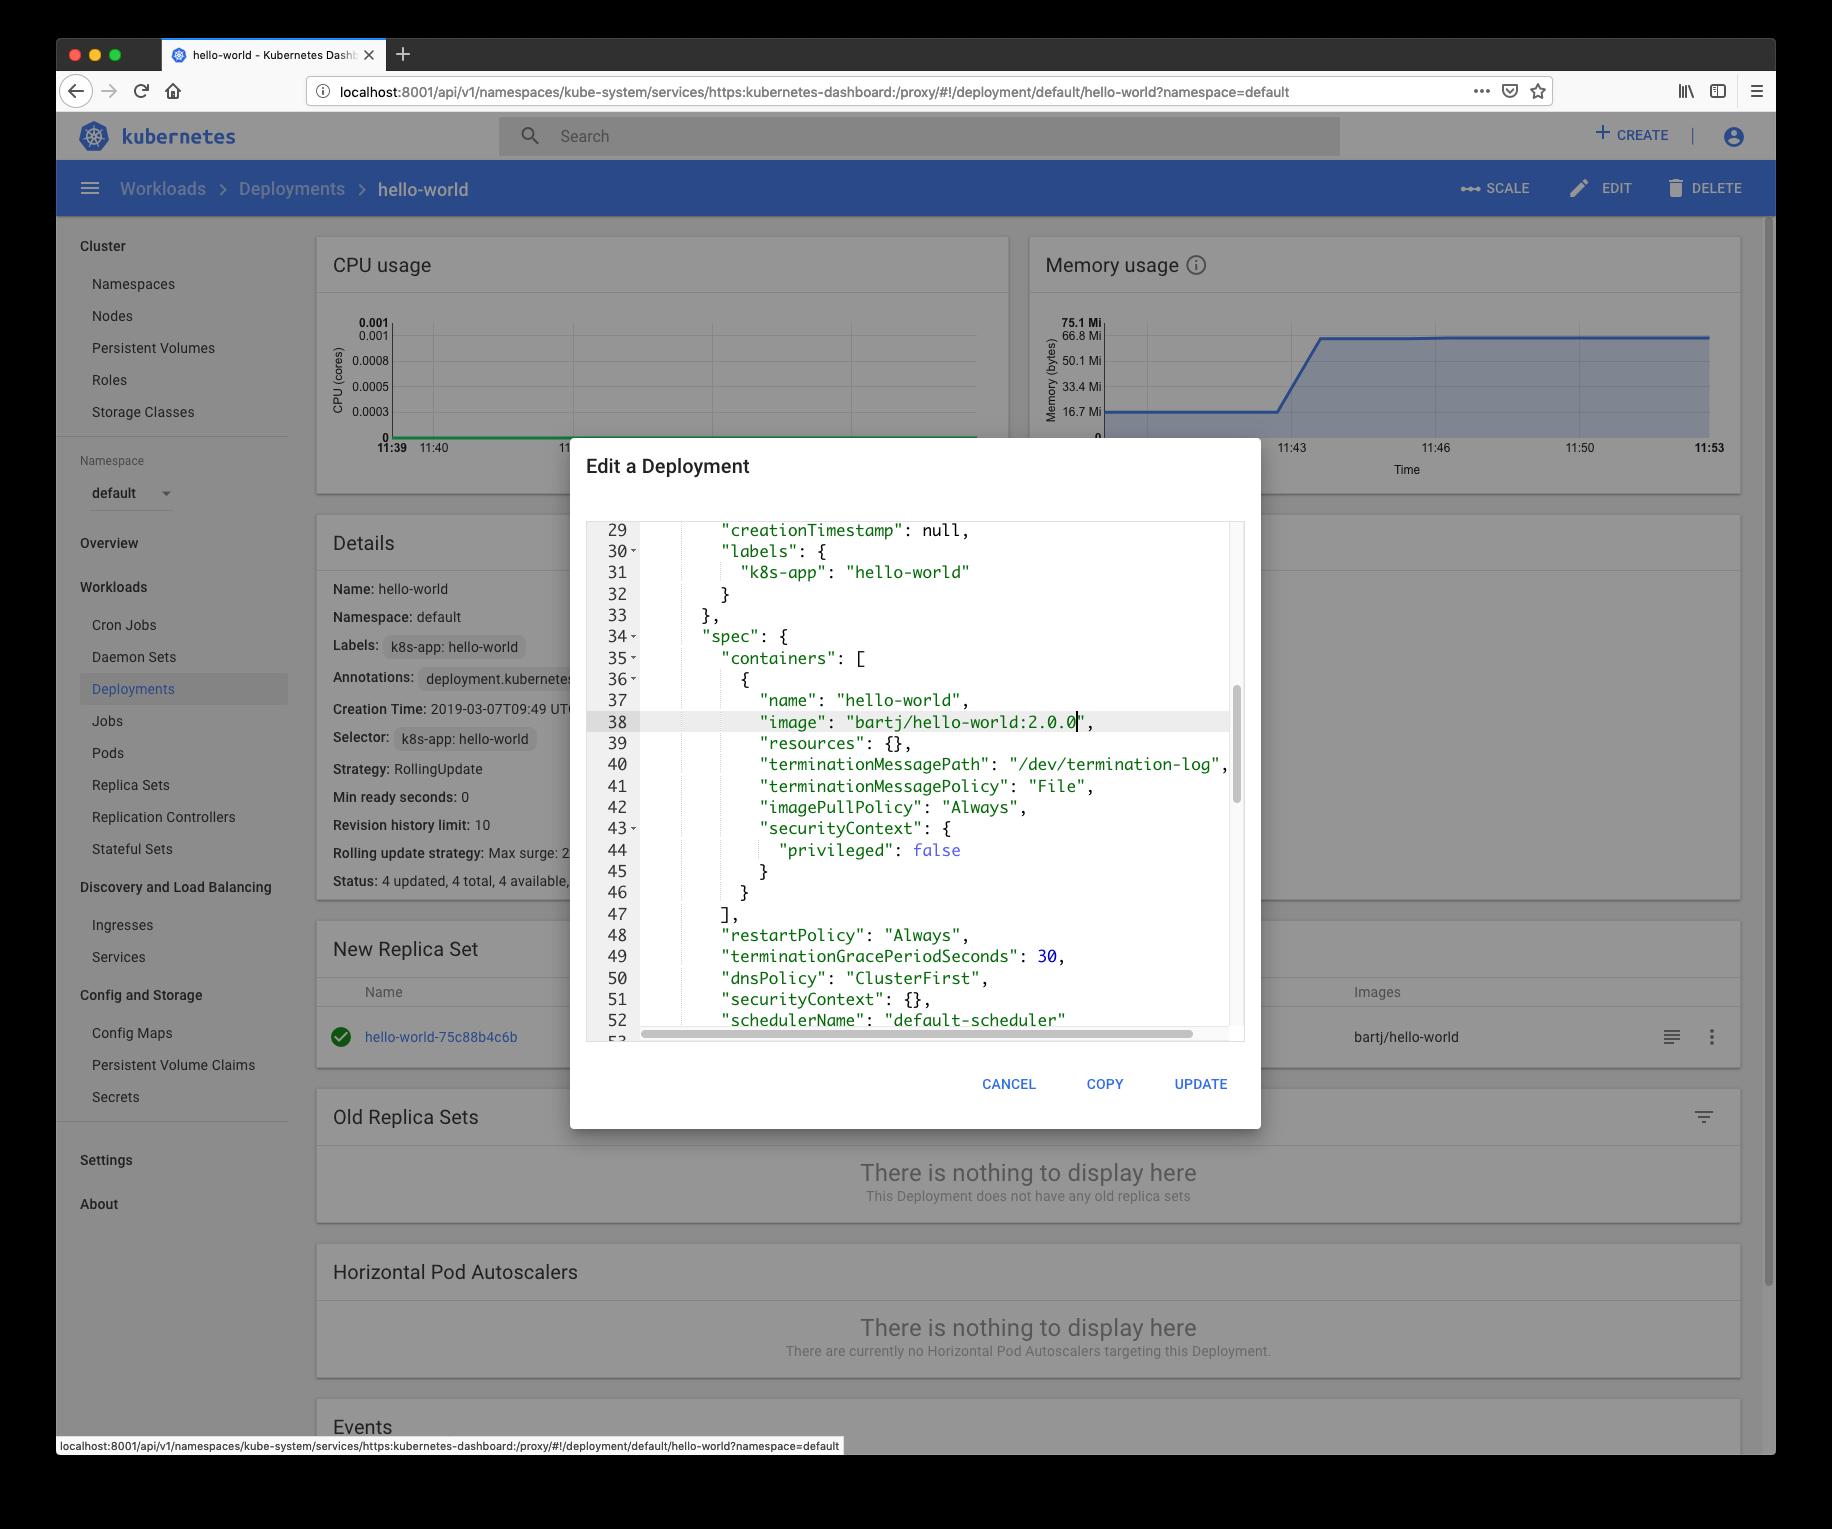 content/kubernetes/images/edit-deployment-image.png